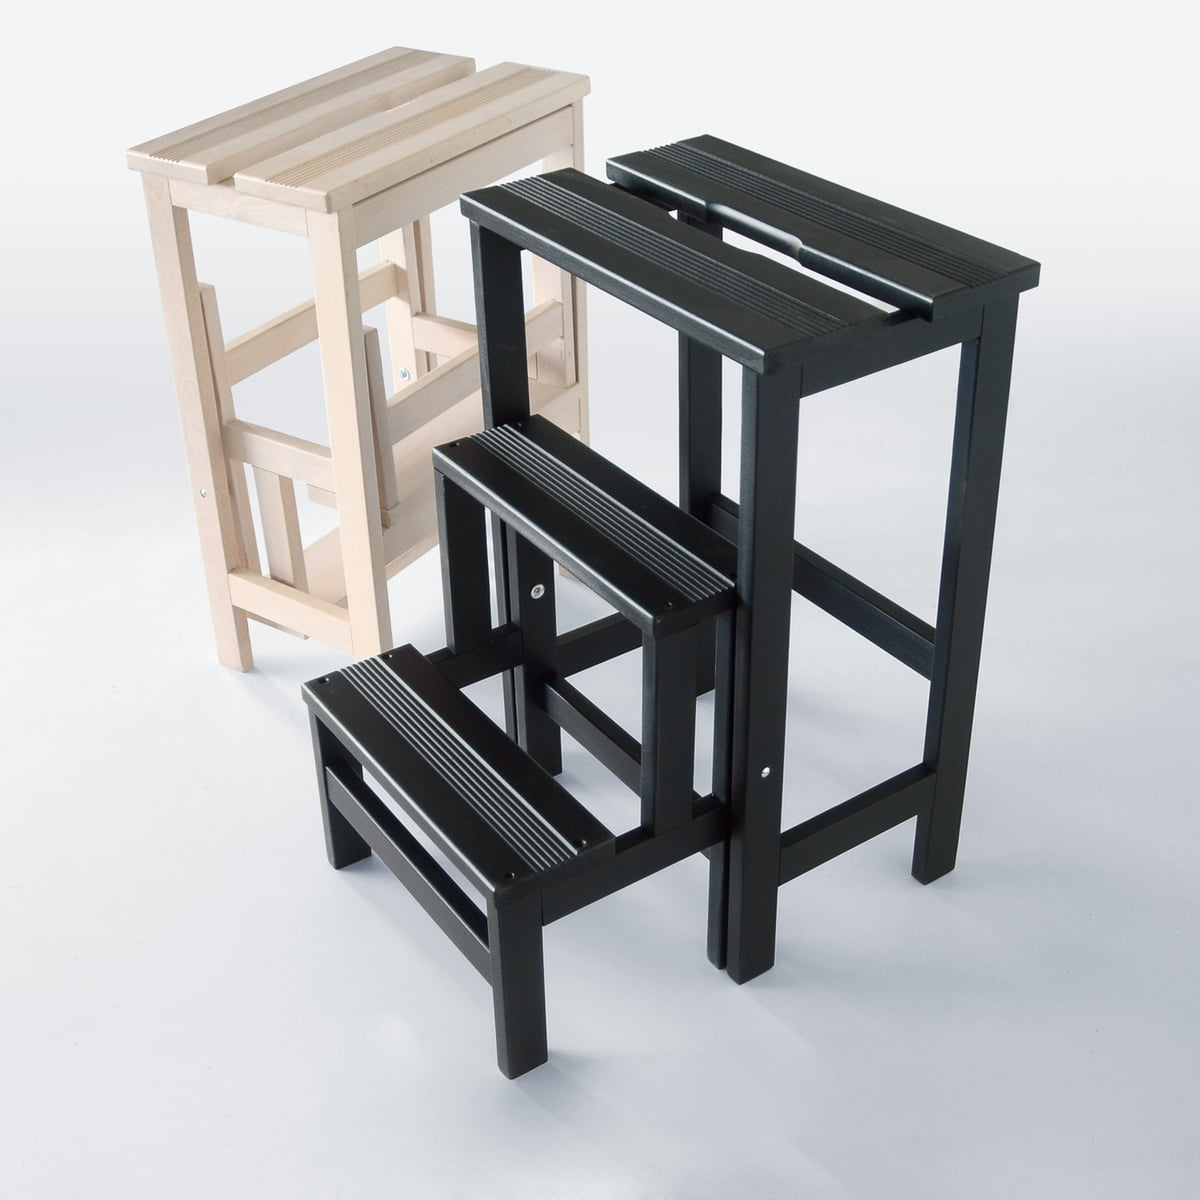 Step Stool By Radius Design Connox Shop